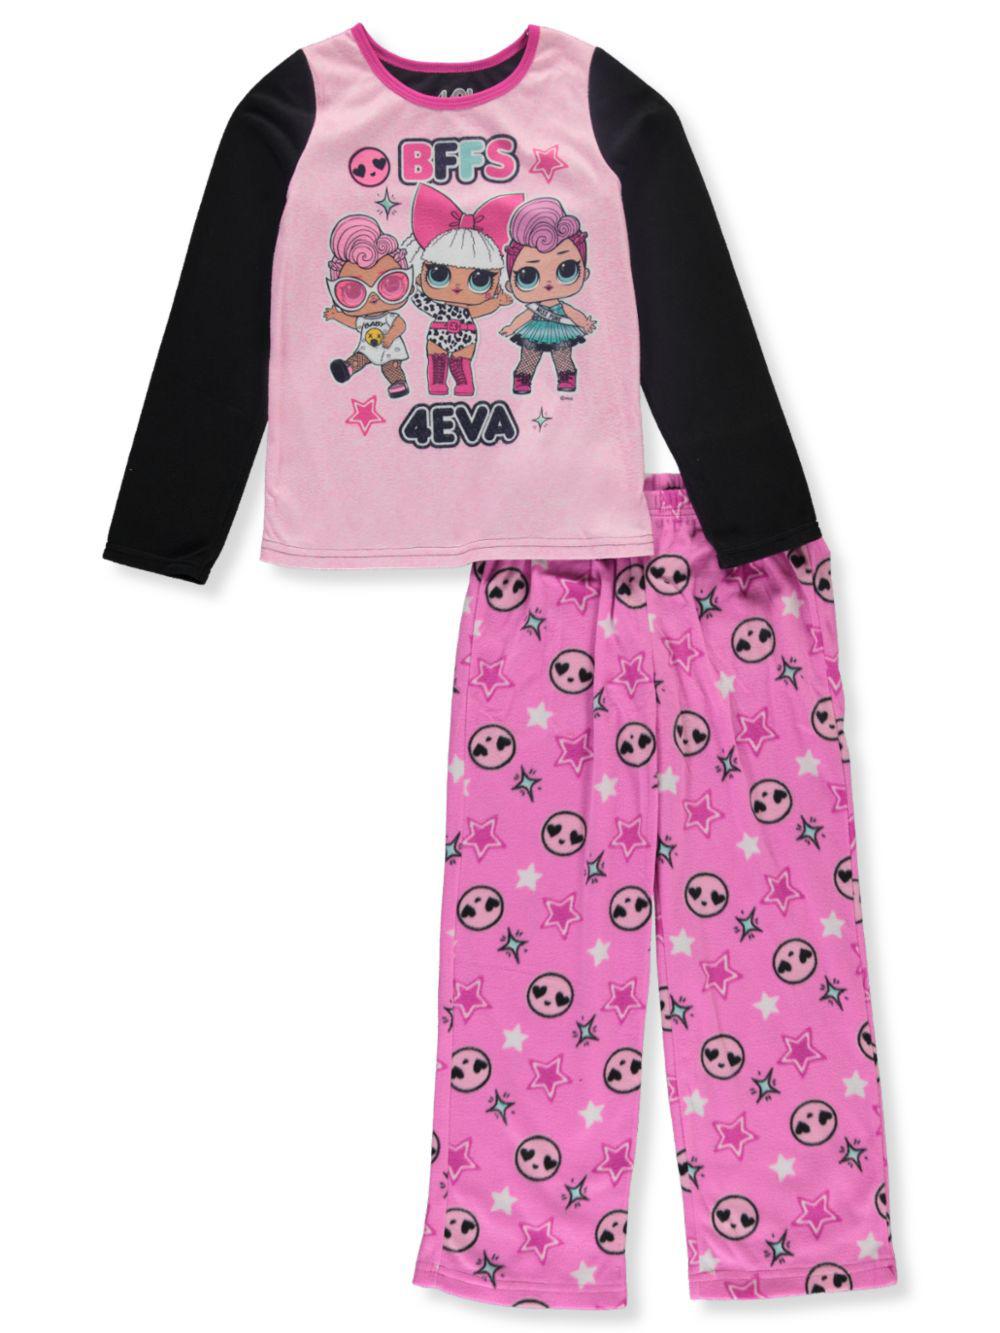 Short Sleeve Shirt and Shorts Set 100/% Polyester,Girls Sizes 4//5 to 10//12 Surprise L.O.L Girls 2 Piece Pajama Set